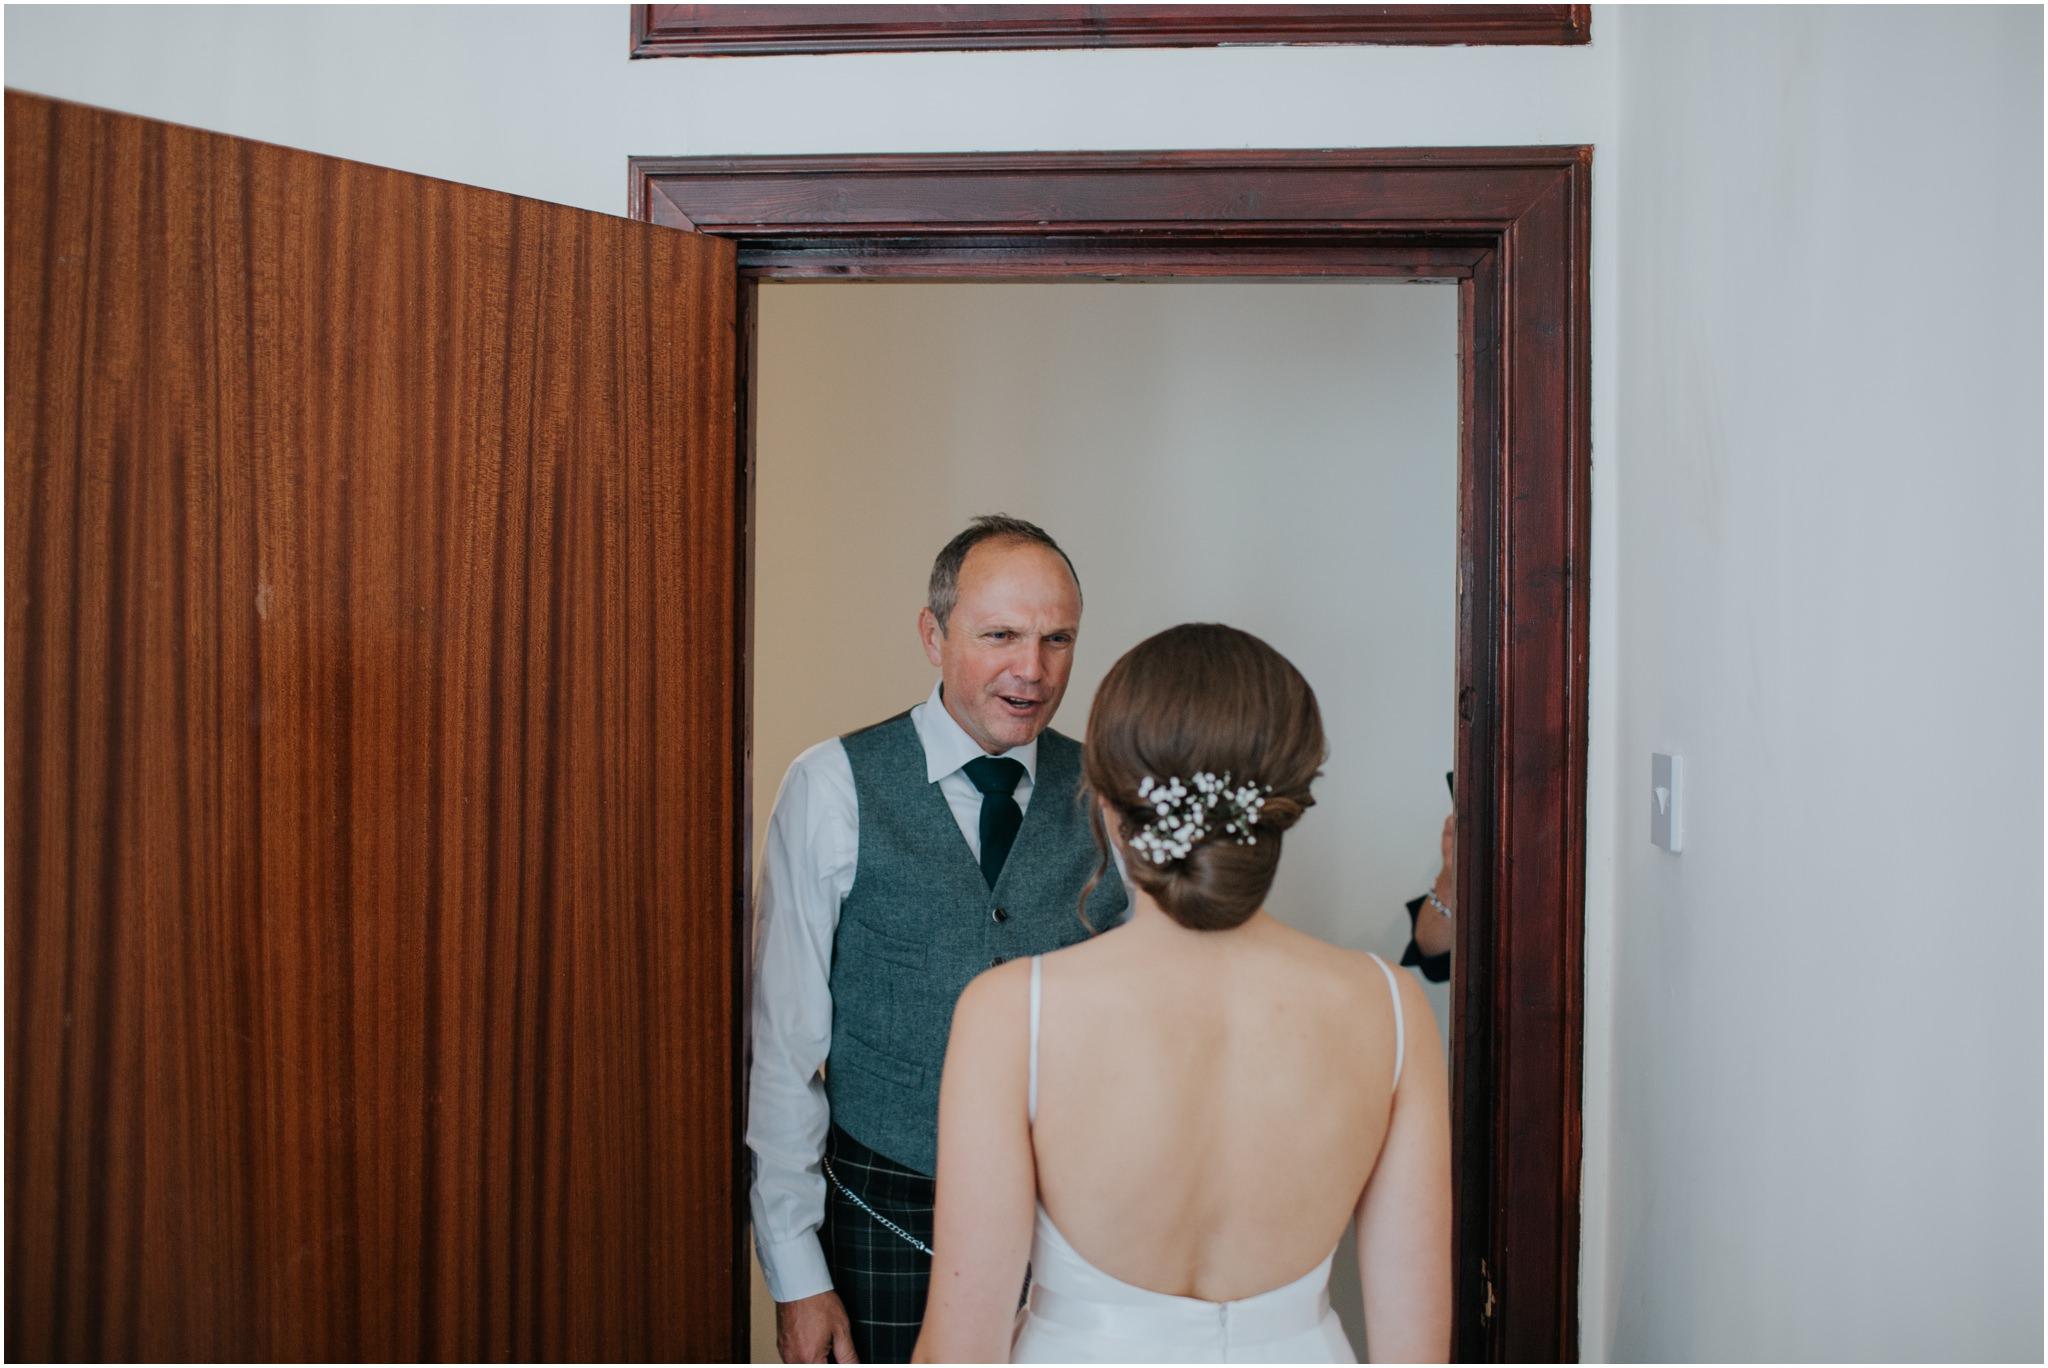 Photography 78 - Glasgow Wedding Photographer - Jordan & Abi - The Waterside Hotel, West Kilbride_0027a.jpg